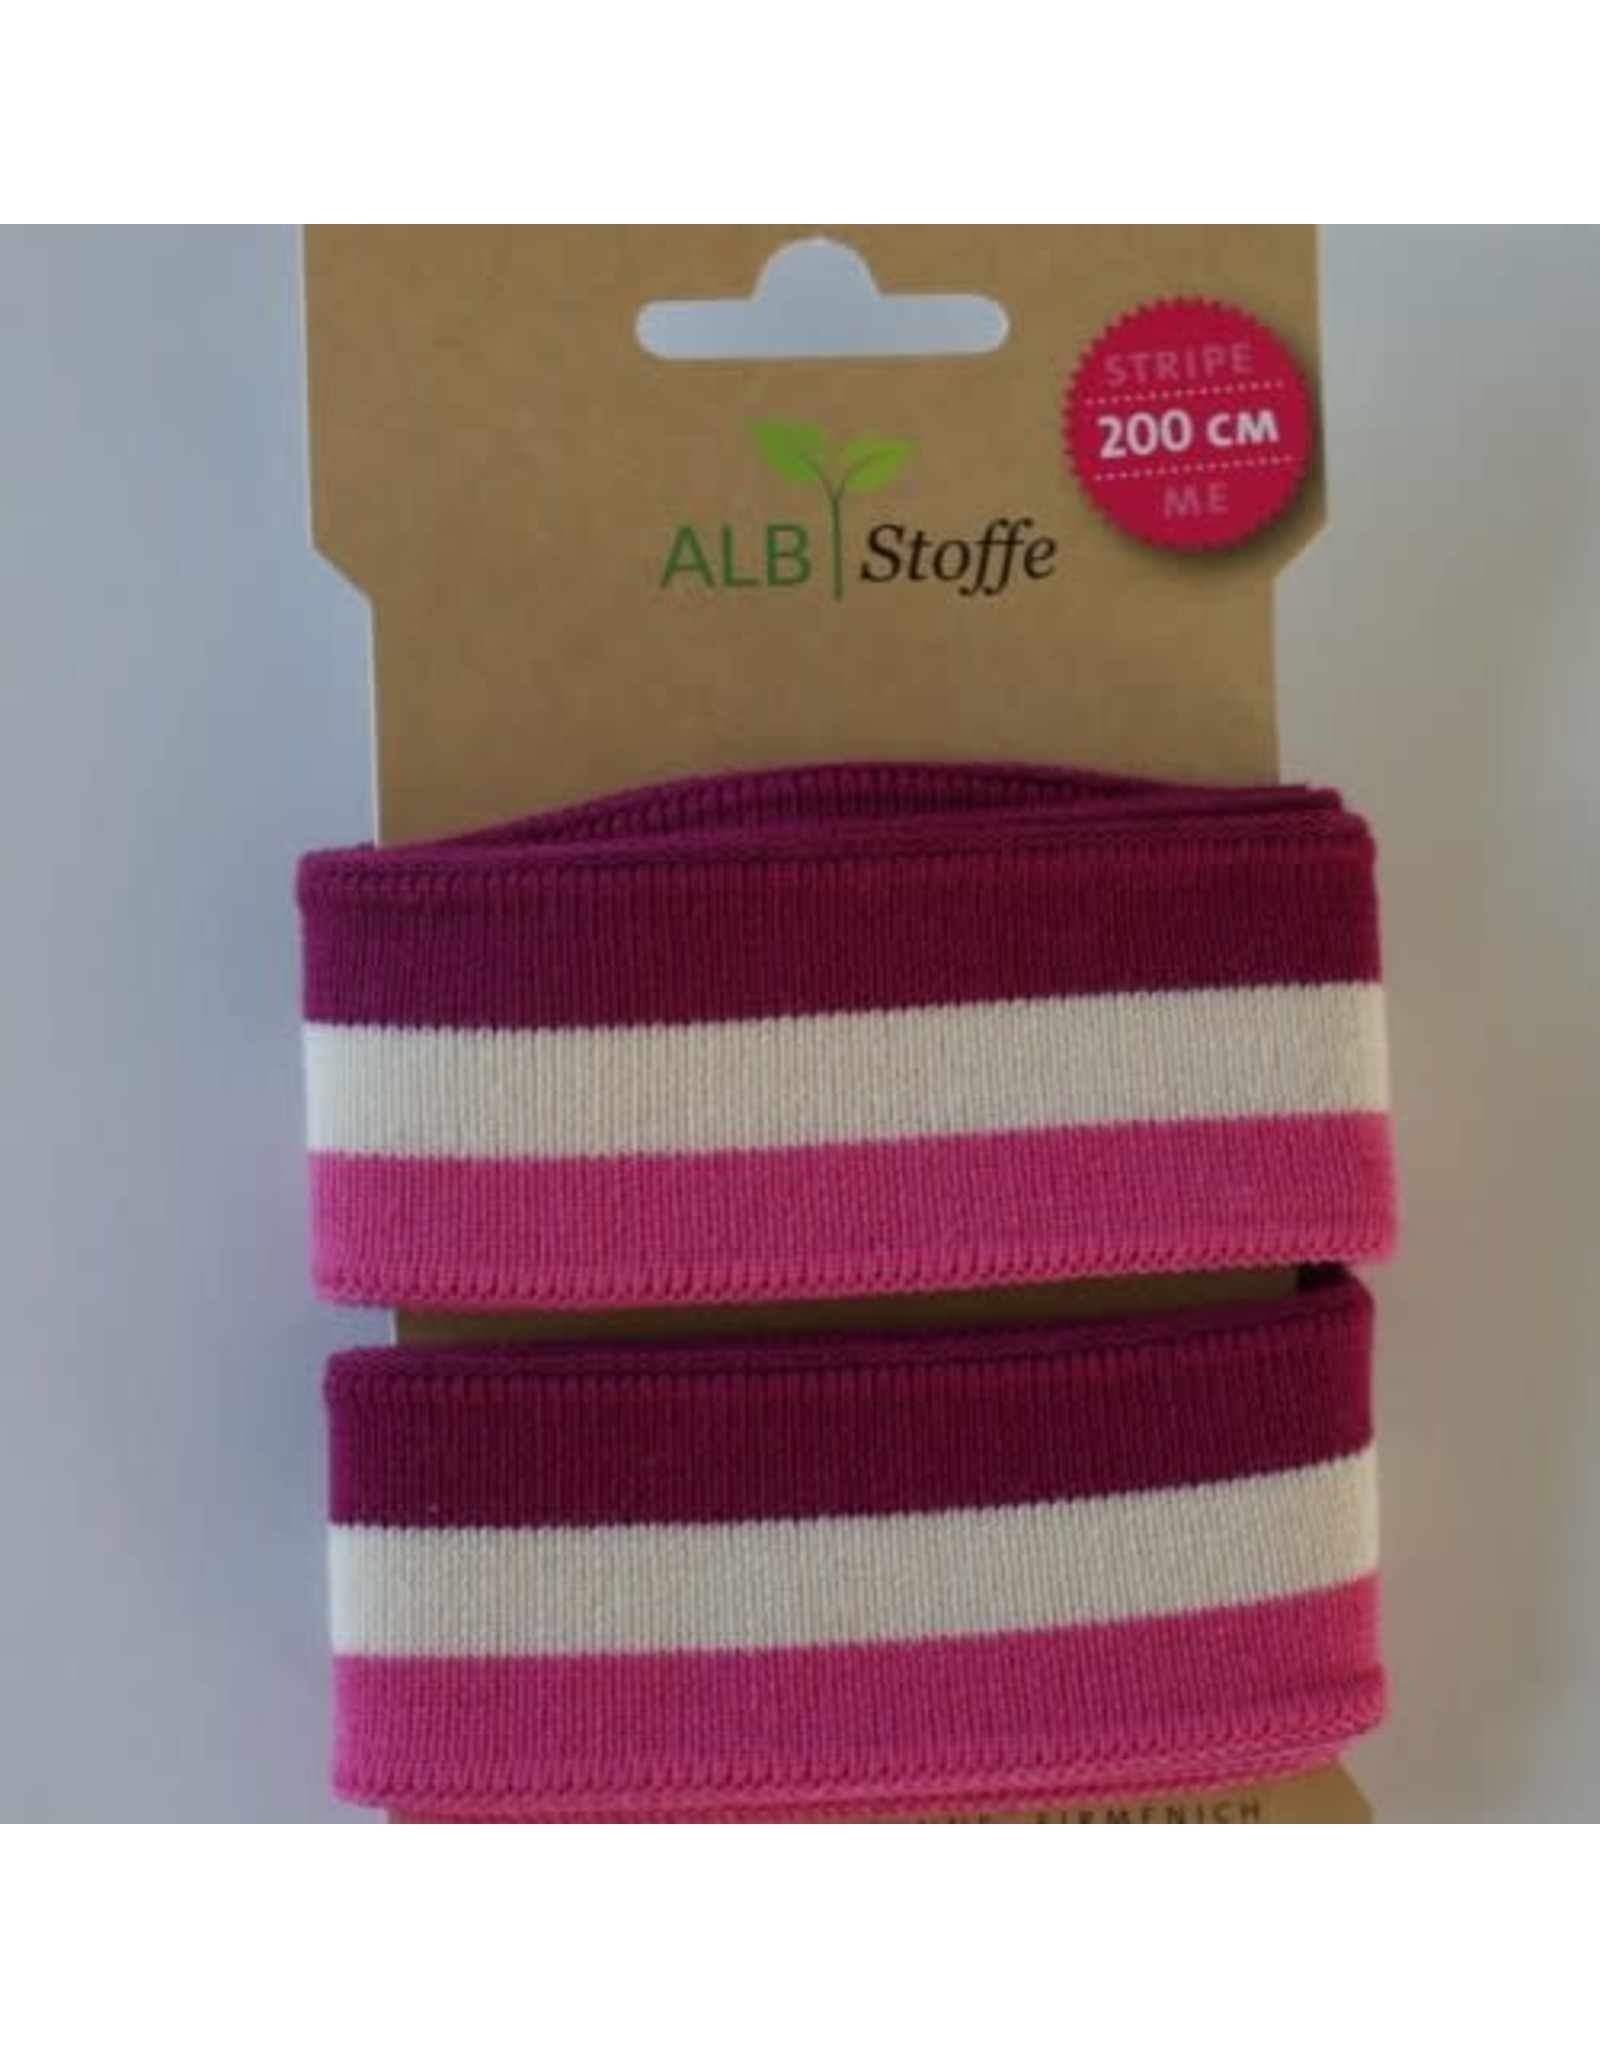 Alb stoffe Stripe me roze beige fushia